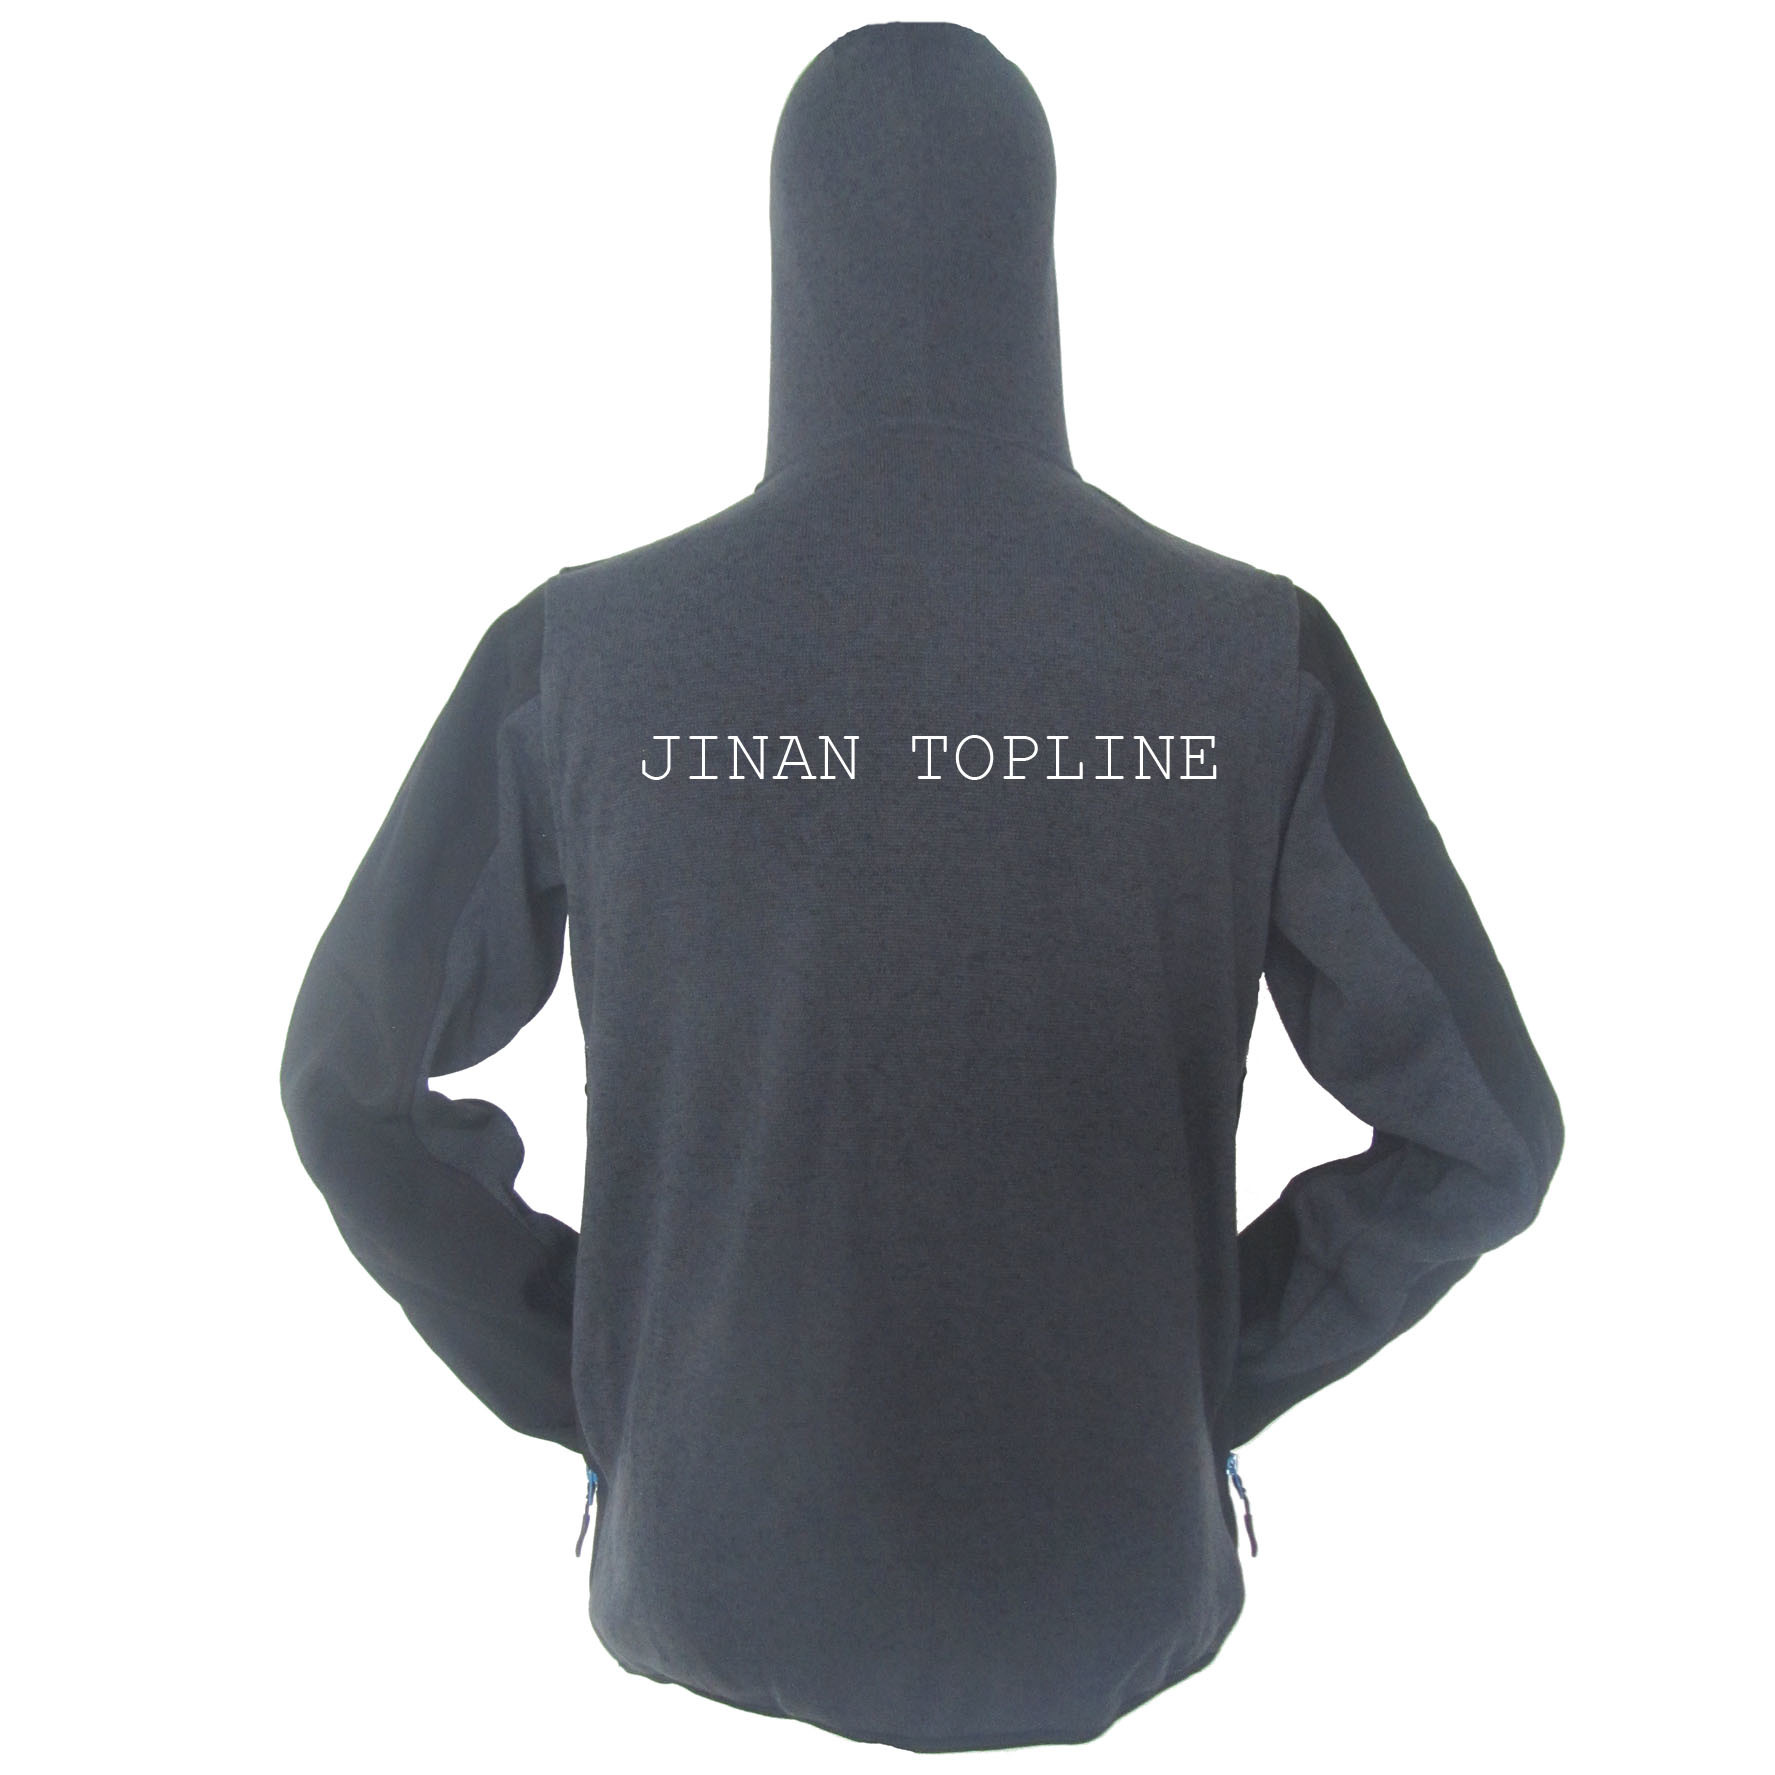 Cationic Dyed Polar Fleece Micro Fleece Hoody Stitching Color Wind-Proof Casual Jacket